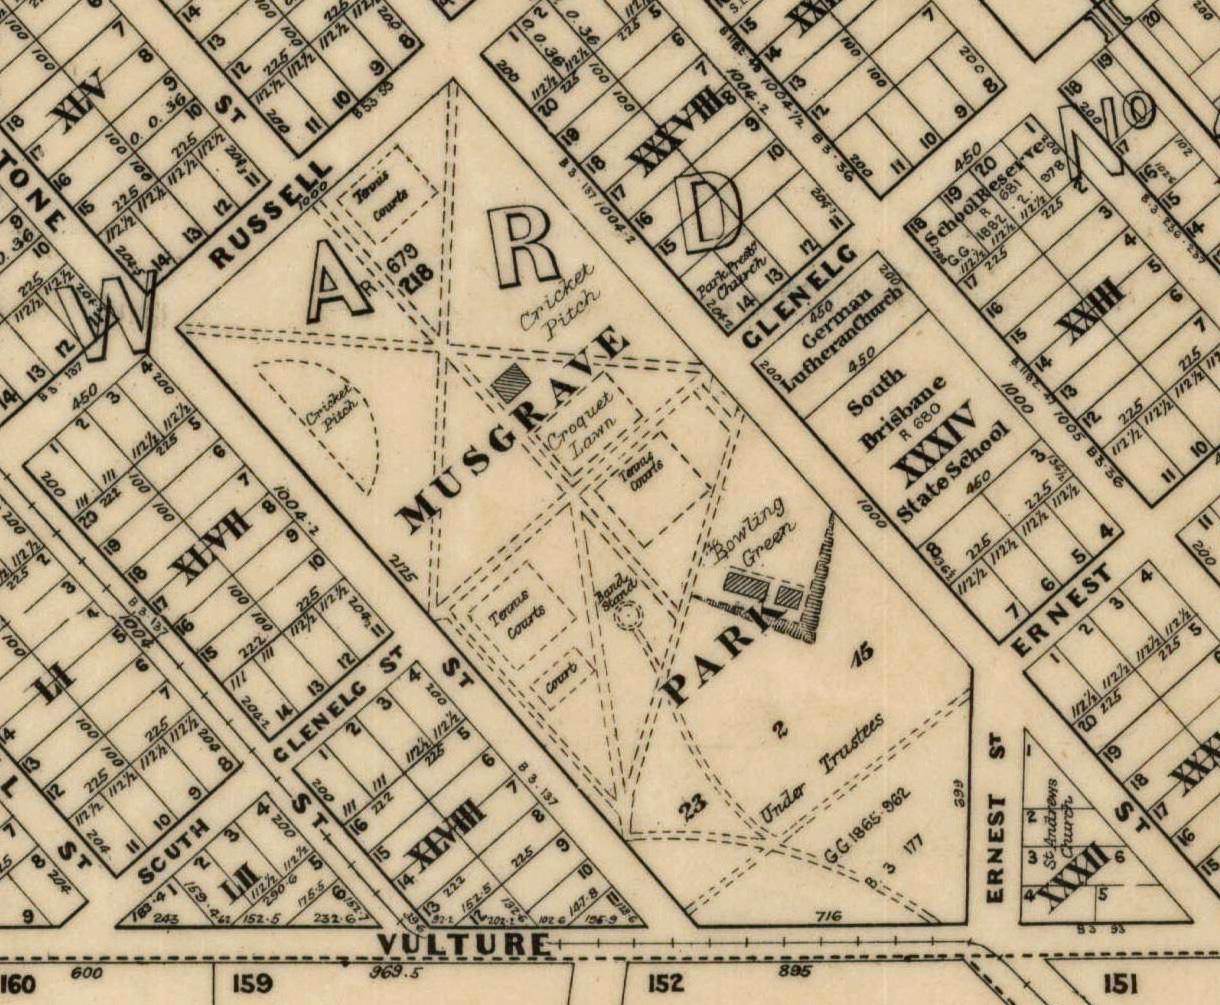 musgrave park 1914 survey map state archives